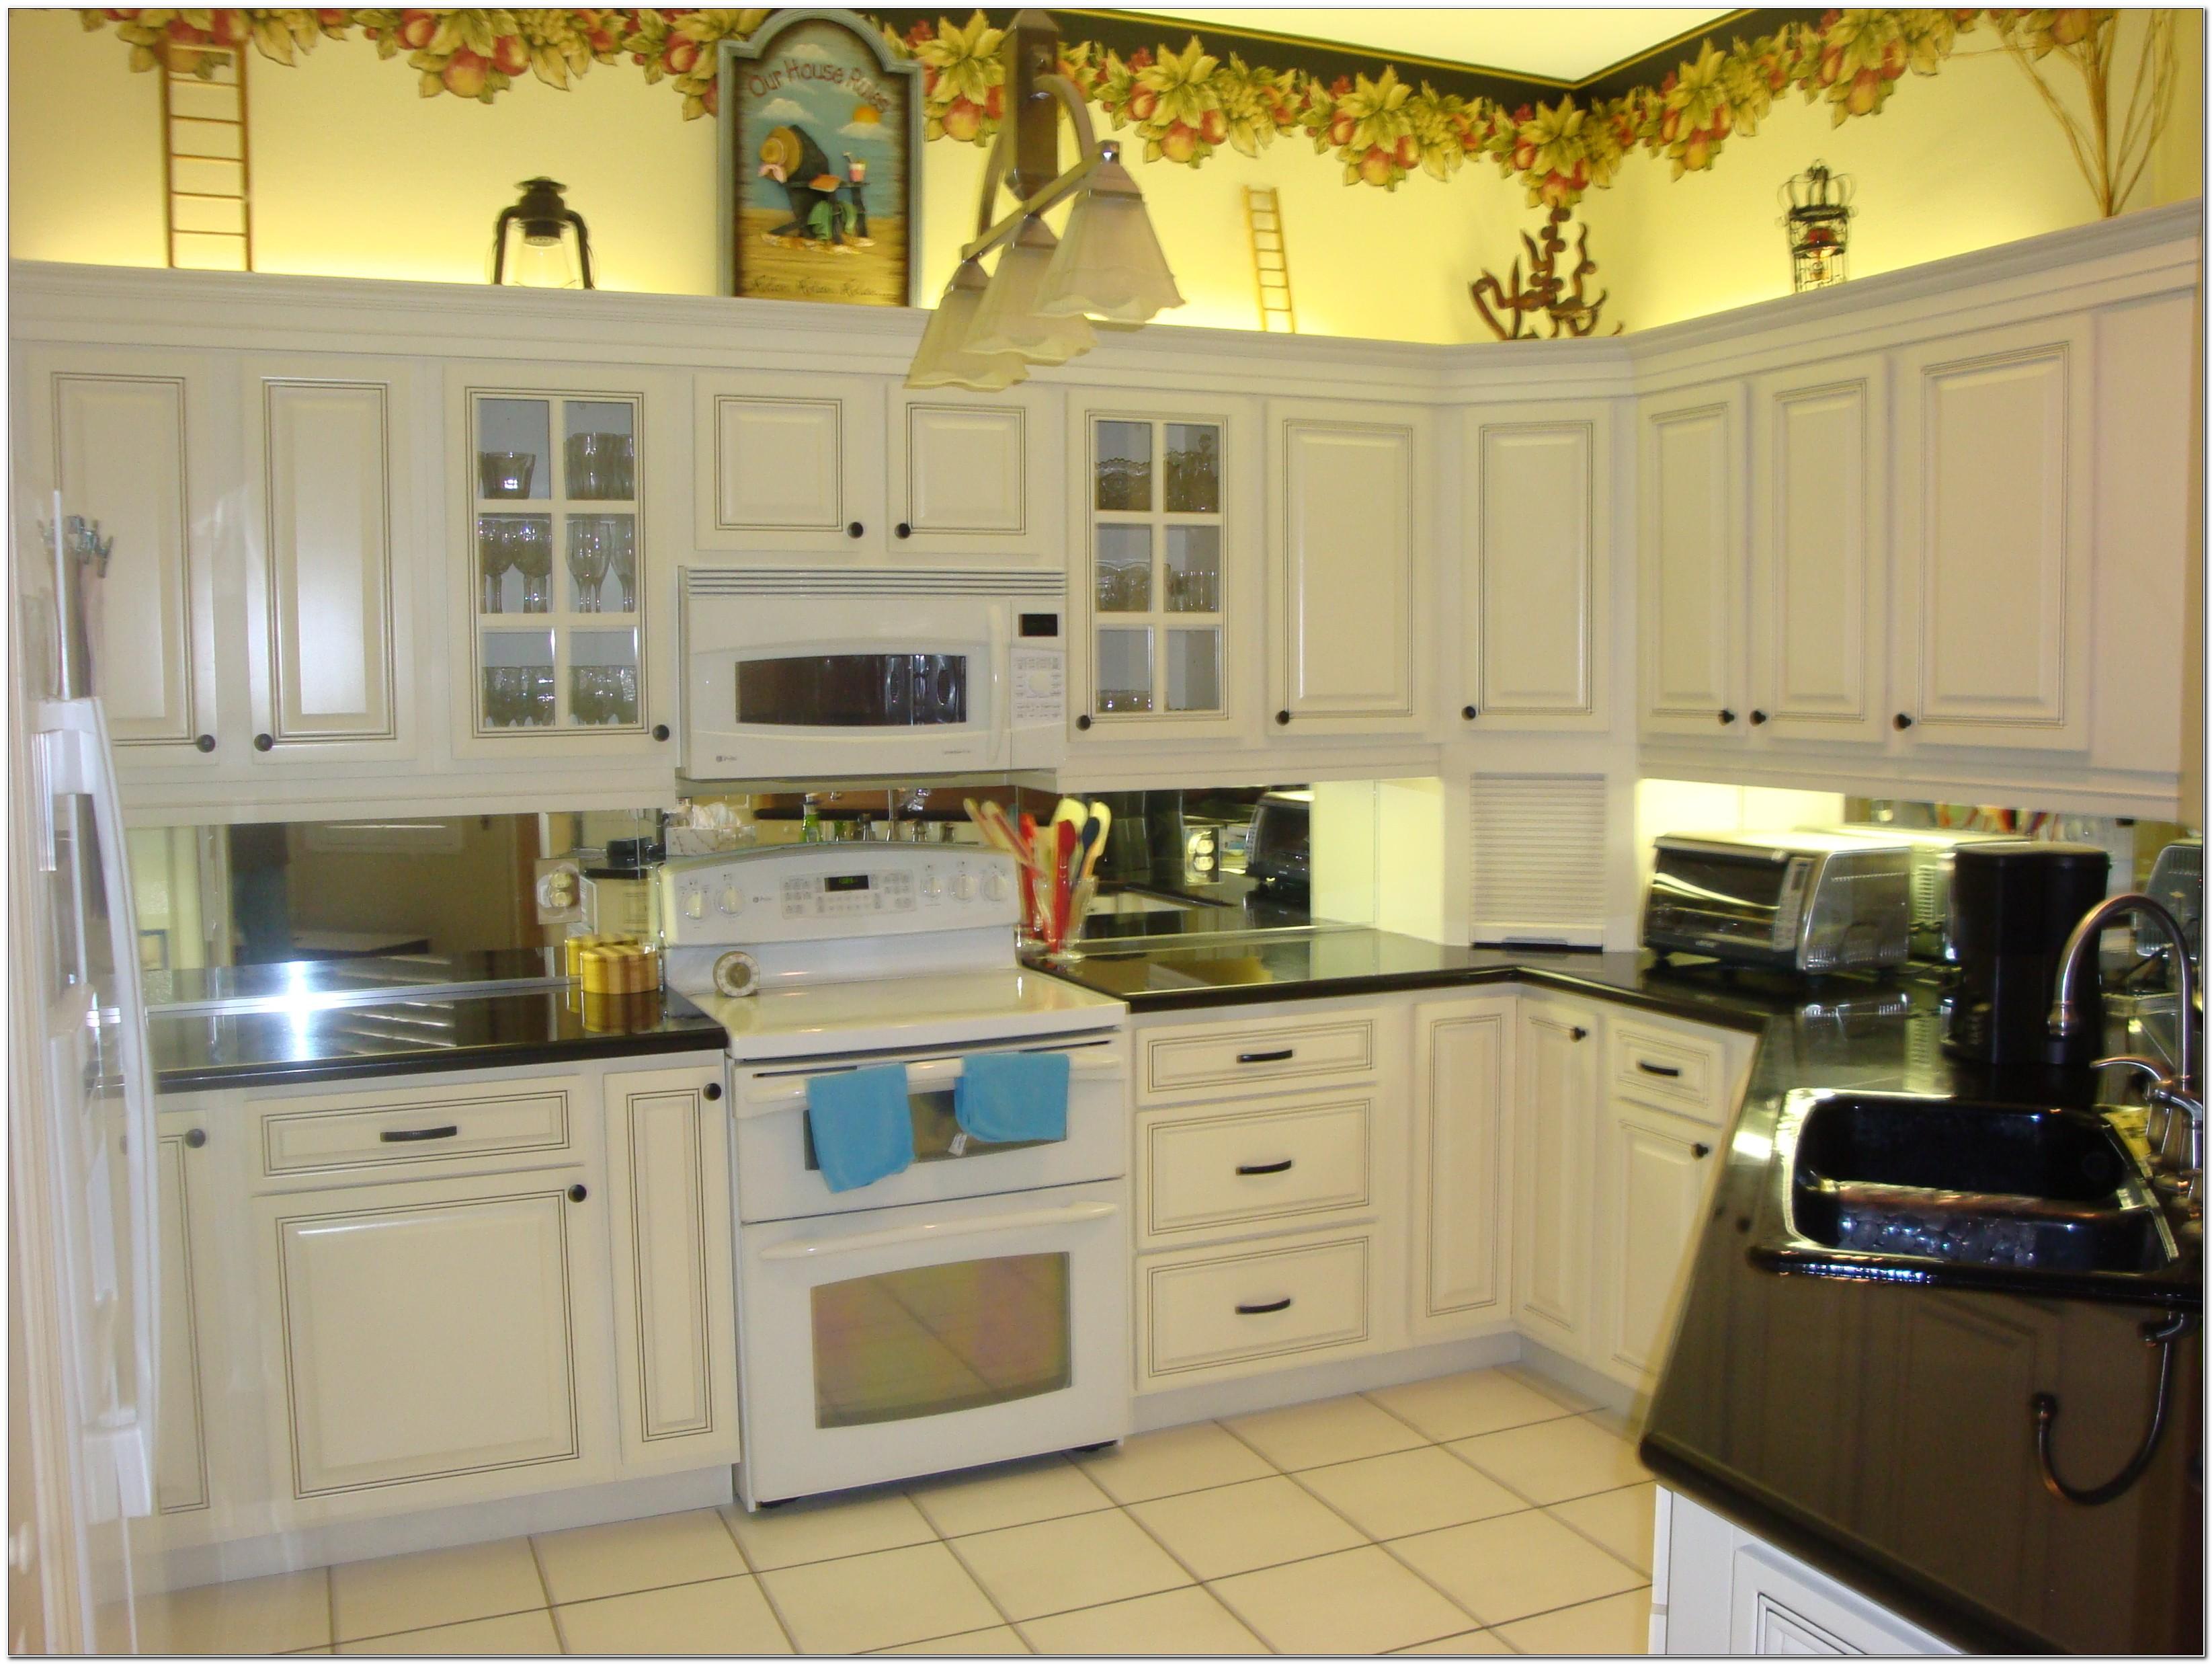 Kitchen Cabinet Refacing Melbourne Fl